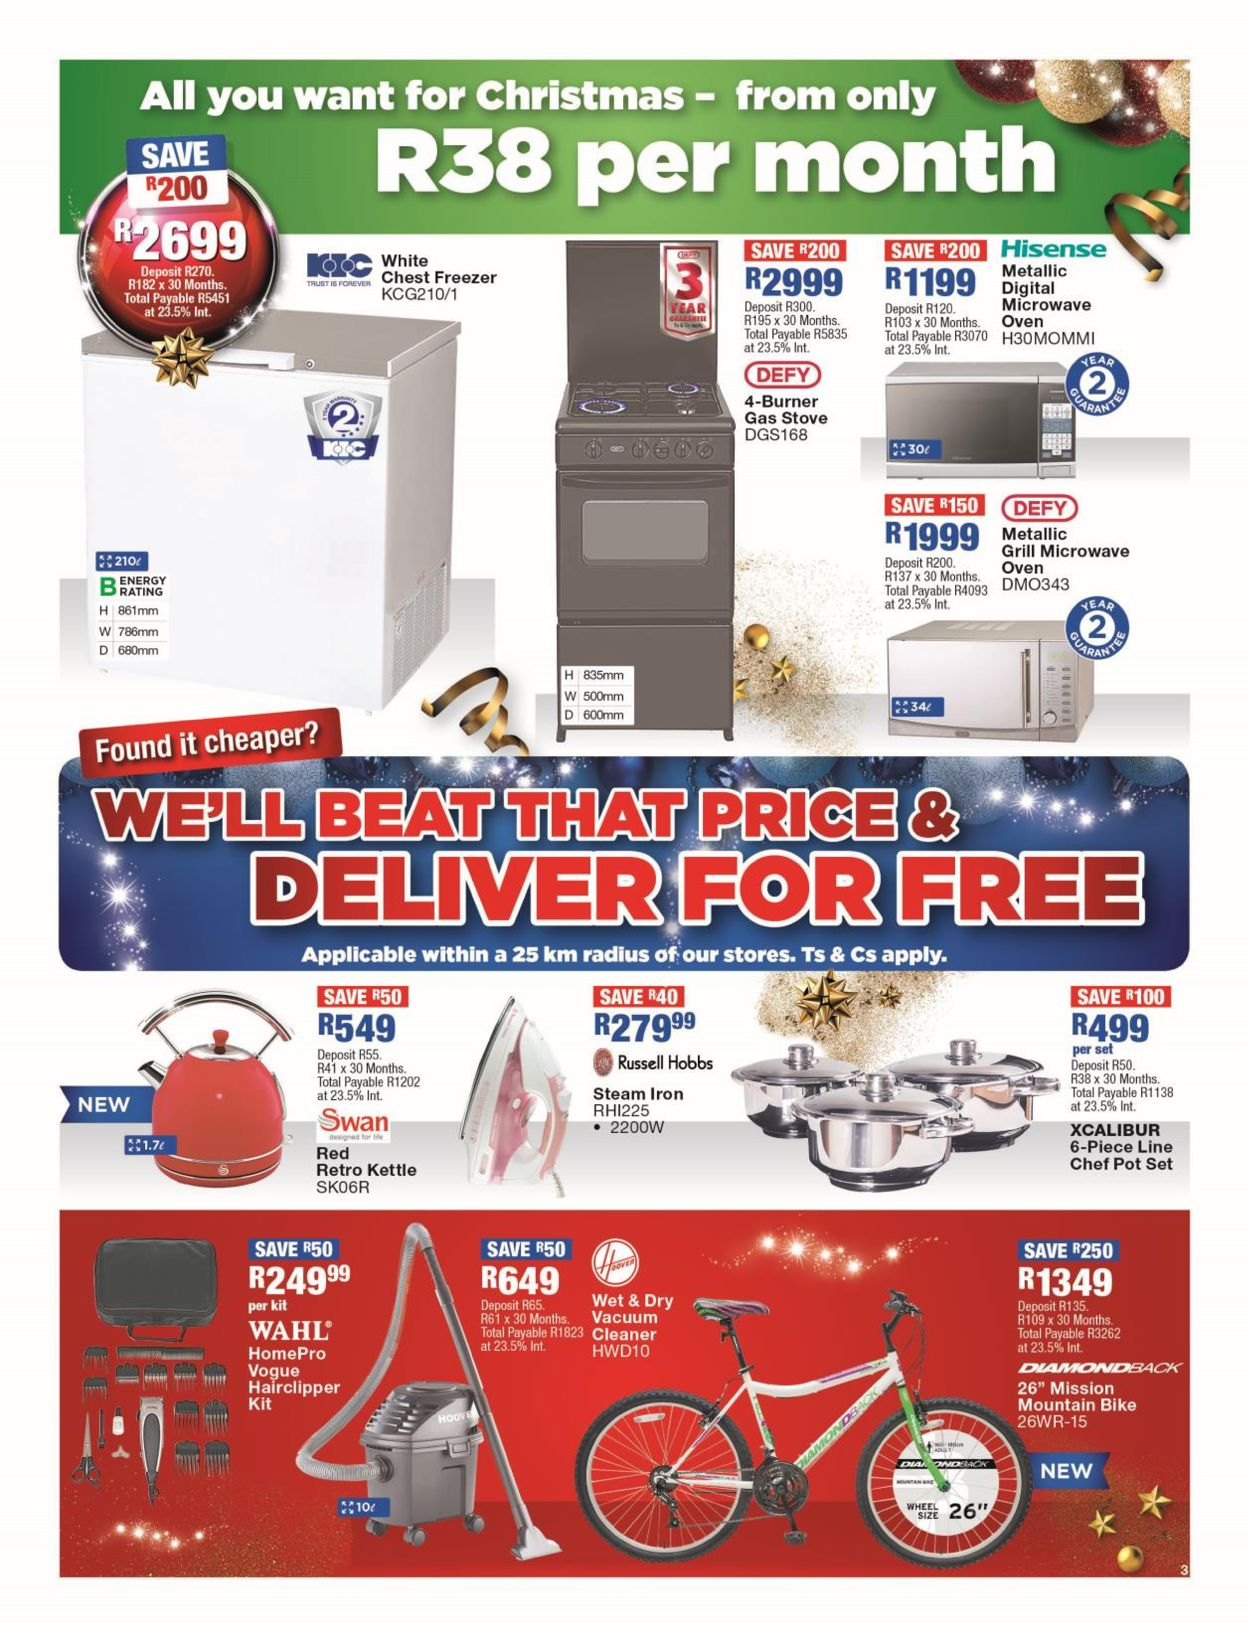 OK Furniture Christmas Catalogue 2019 Catalogue - 2019/11/15-2019/11/24 (Page 3)